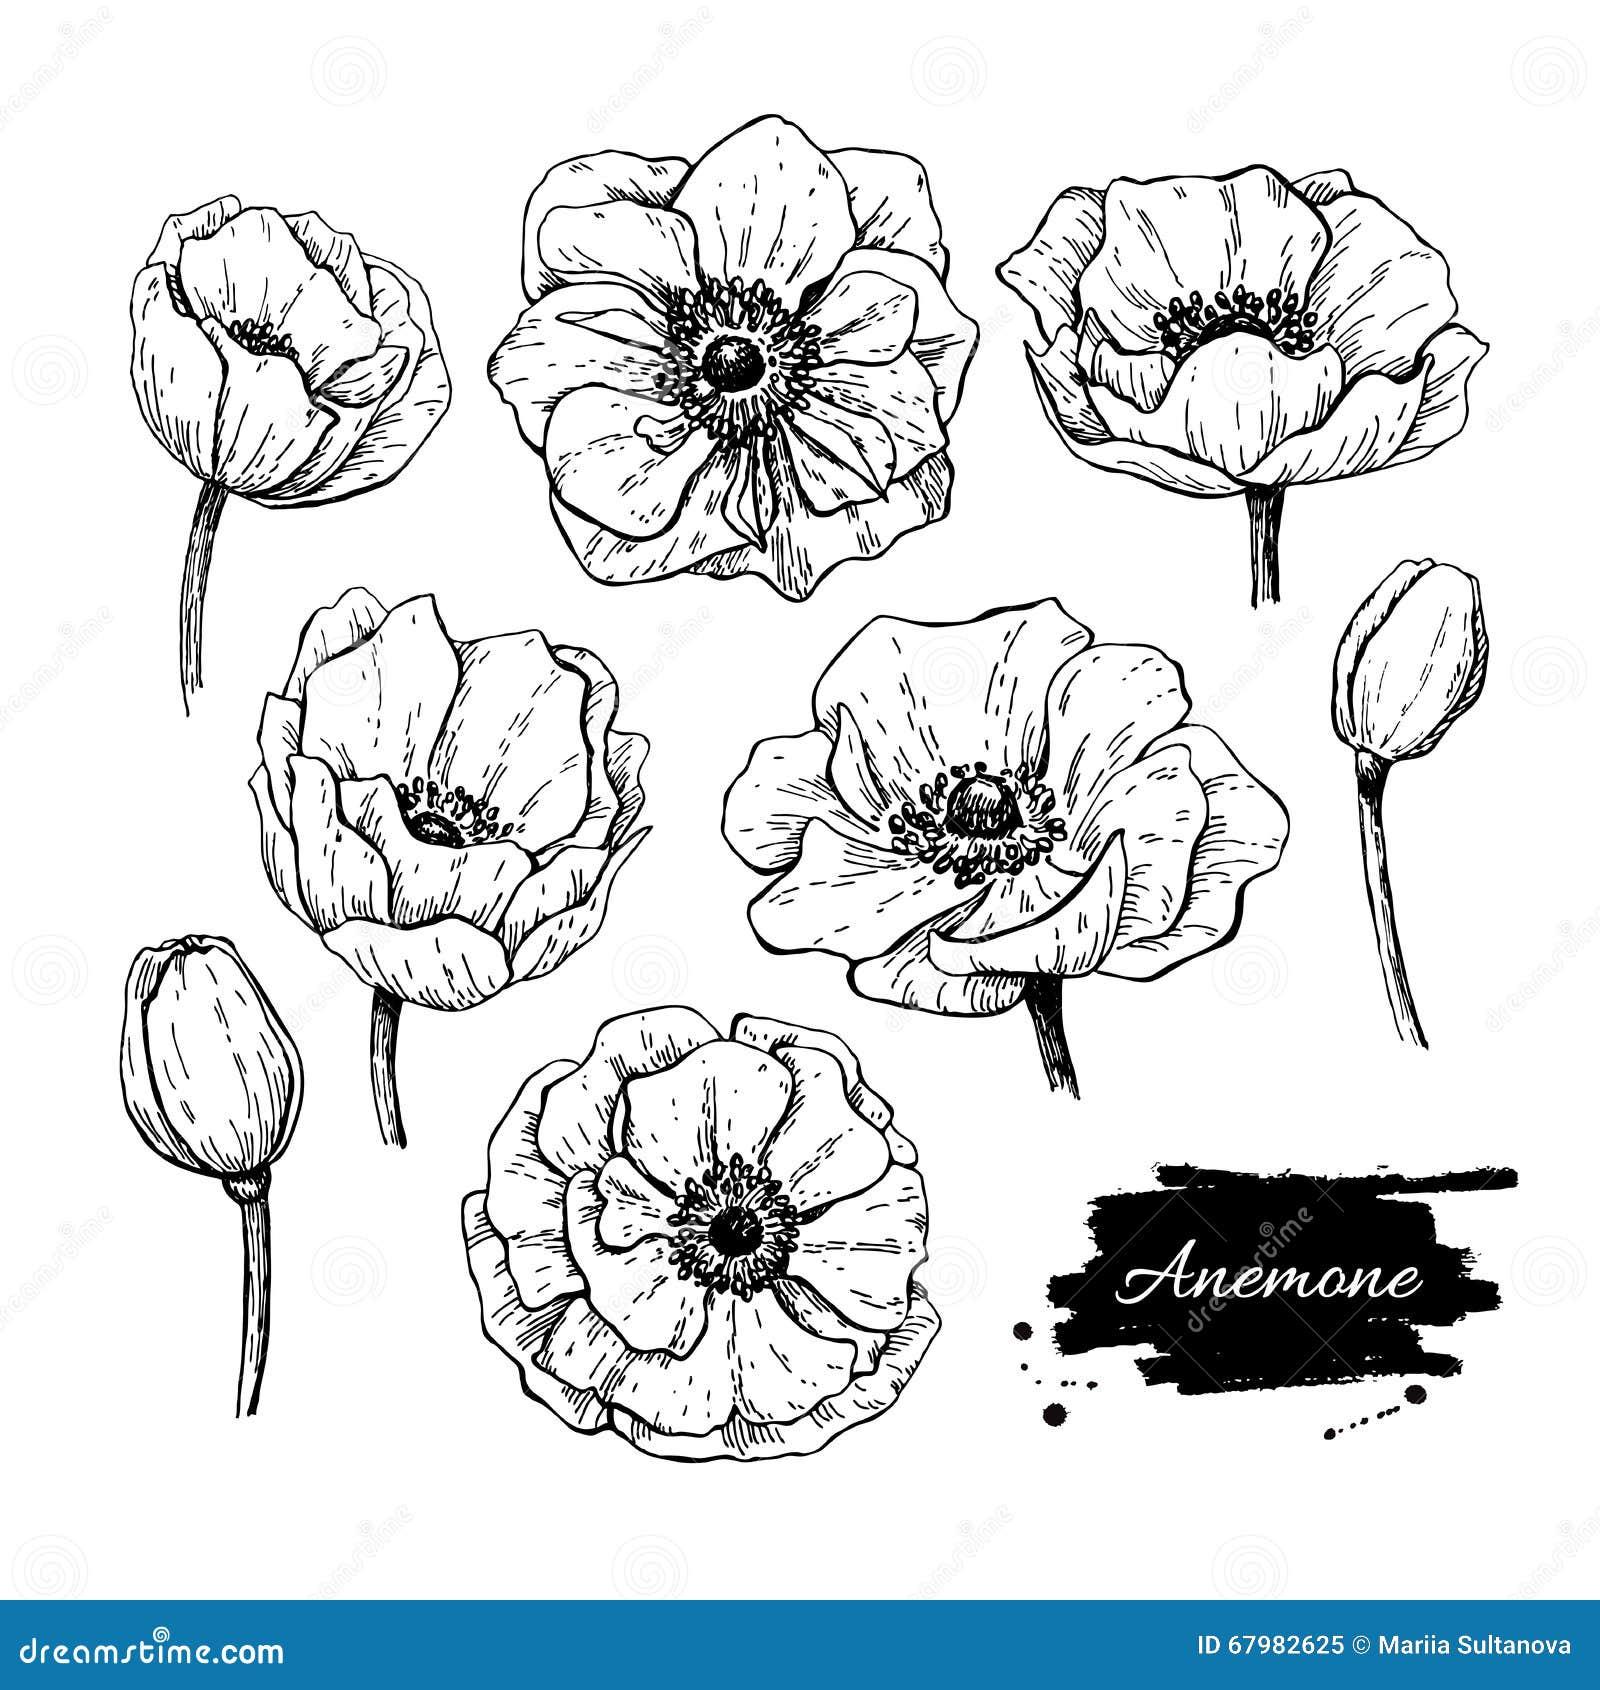 Anemone Flower Line Drawing : Vector vintage anemone set hand drawn illustration stock